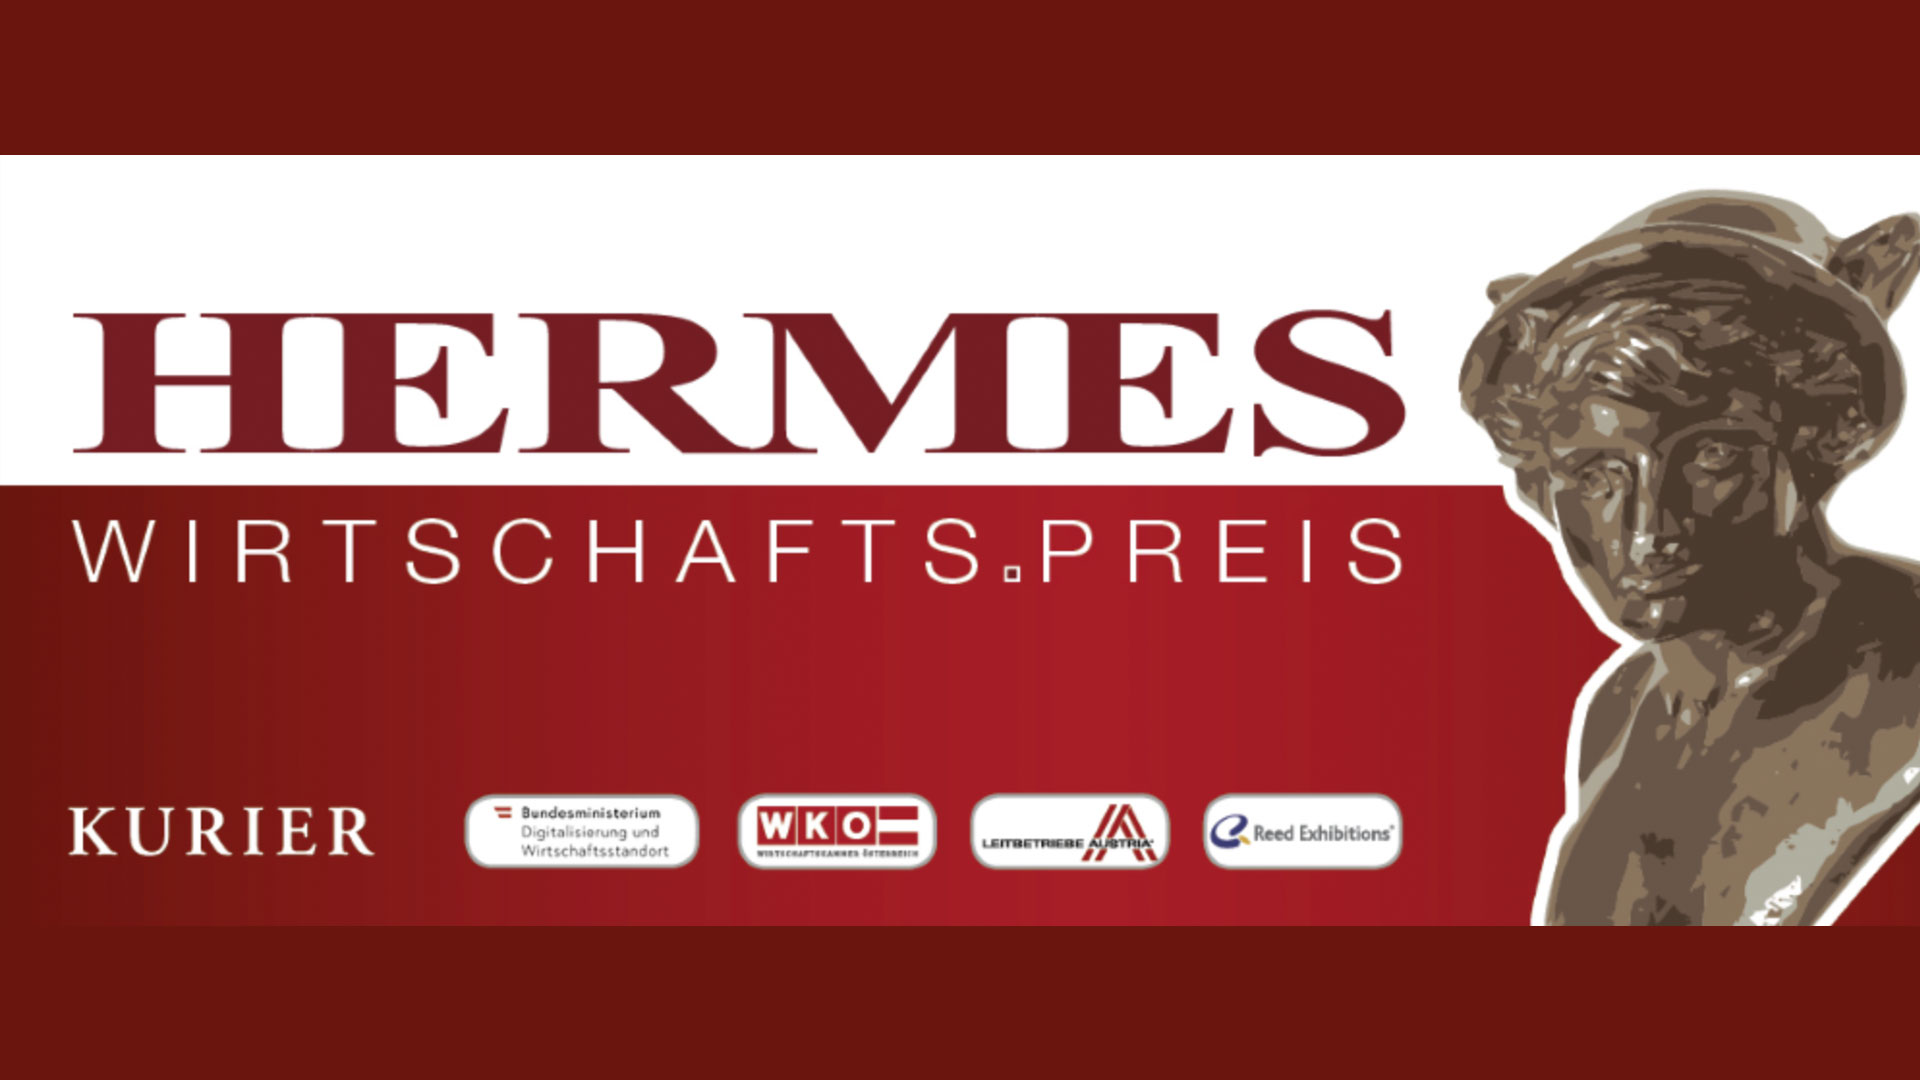 Illustration of the Hermes Business Award